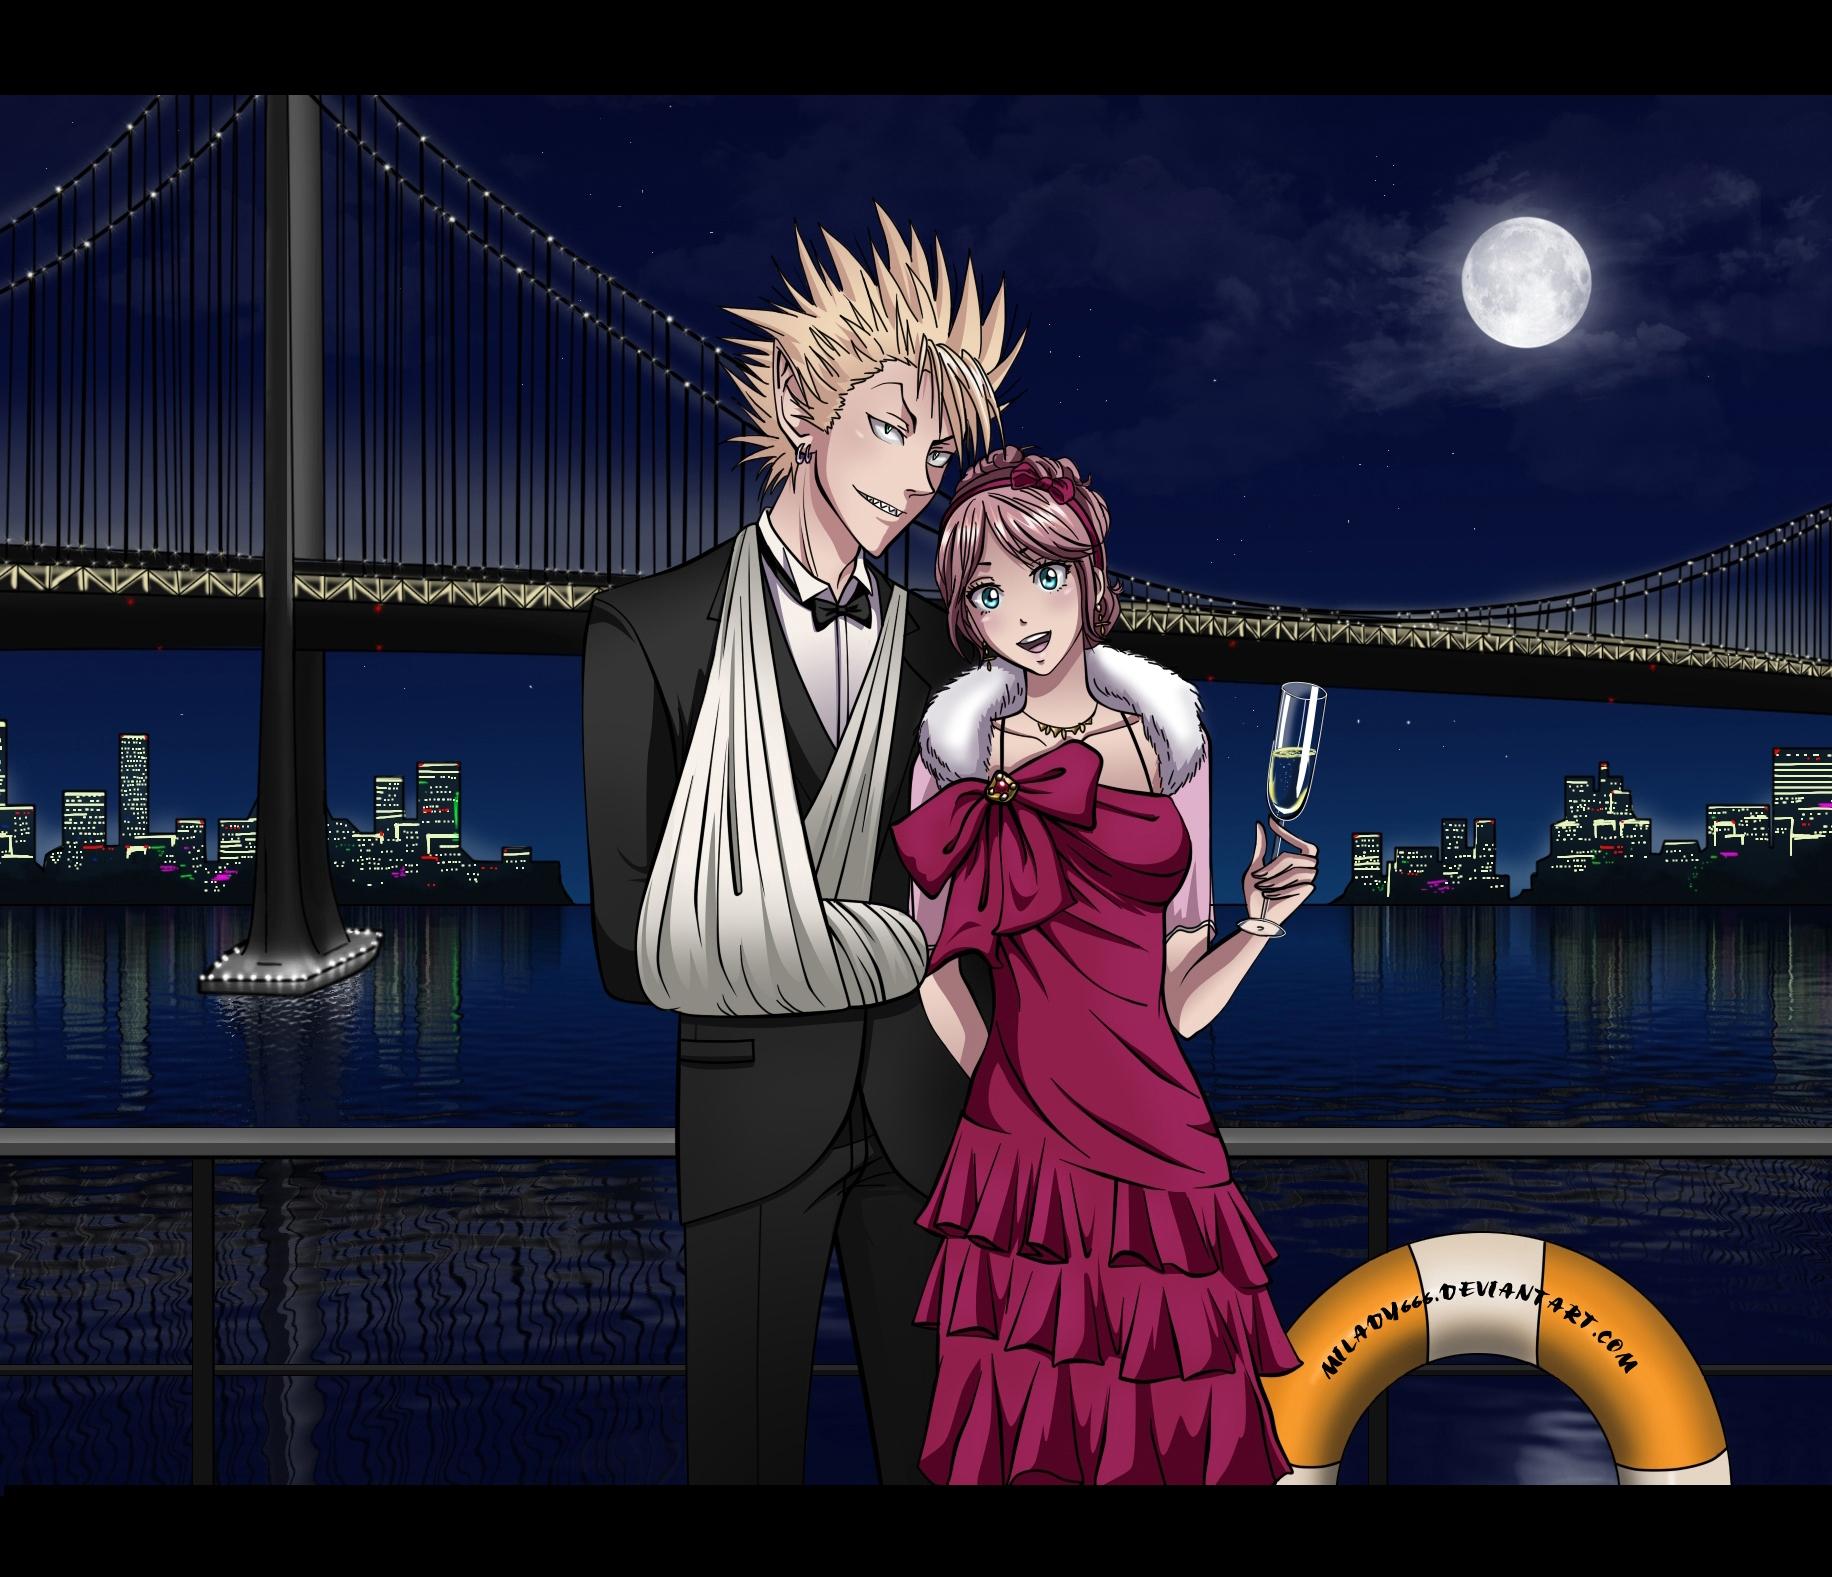 Tags Anime Milady666 Eyeshield 21 Anezaki Mamori Hiruma Yoichi Arm